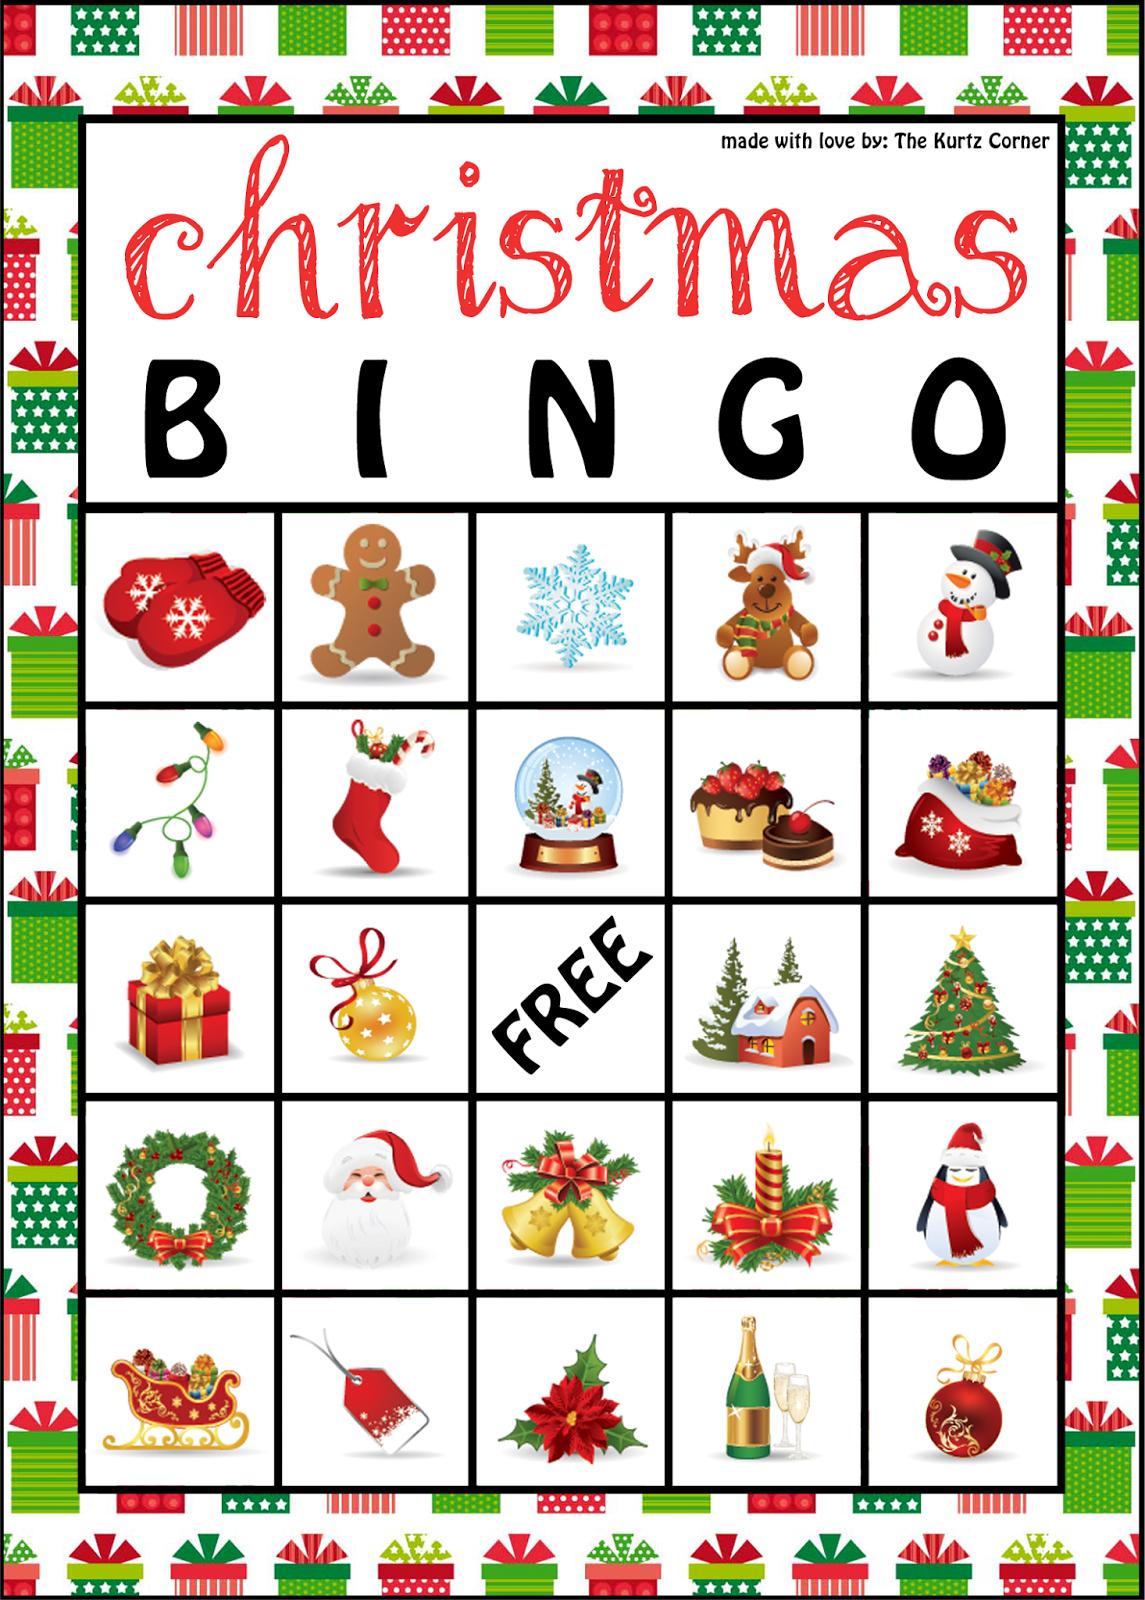 The Kurtz Corner: Free Printable Christmas Bingo Cards | Winter / X - Free Printable Bingo Cards And Call Sheet